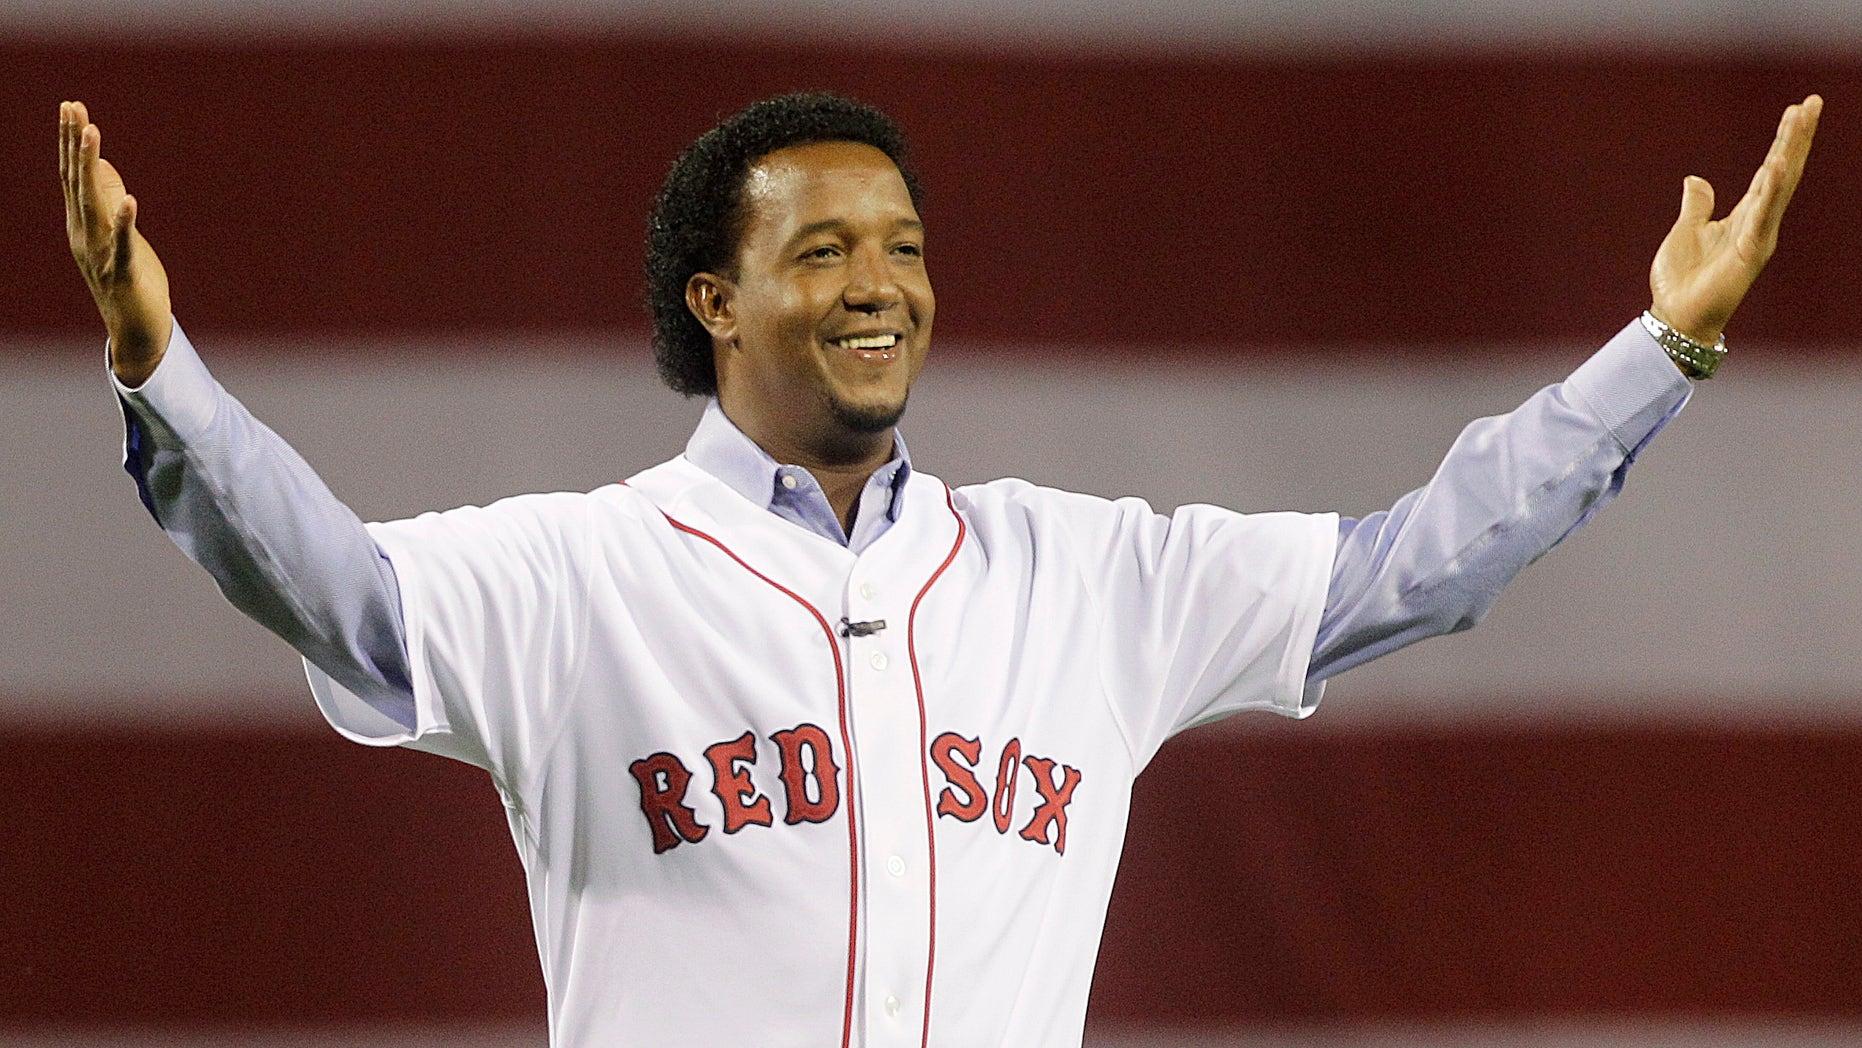 Pedro Martinez greets the Boston crowd on April 4, 2010.